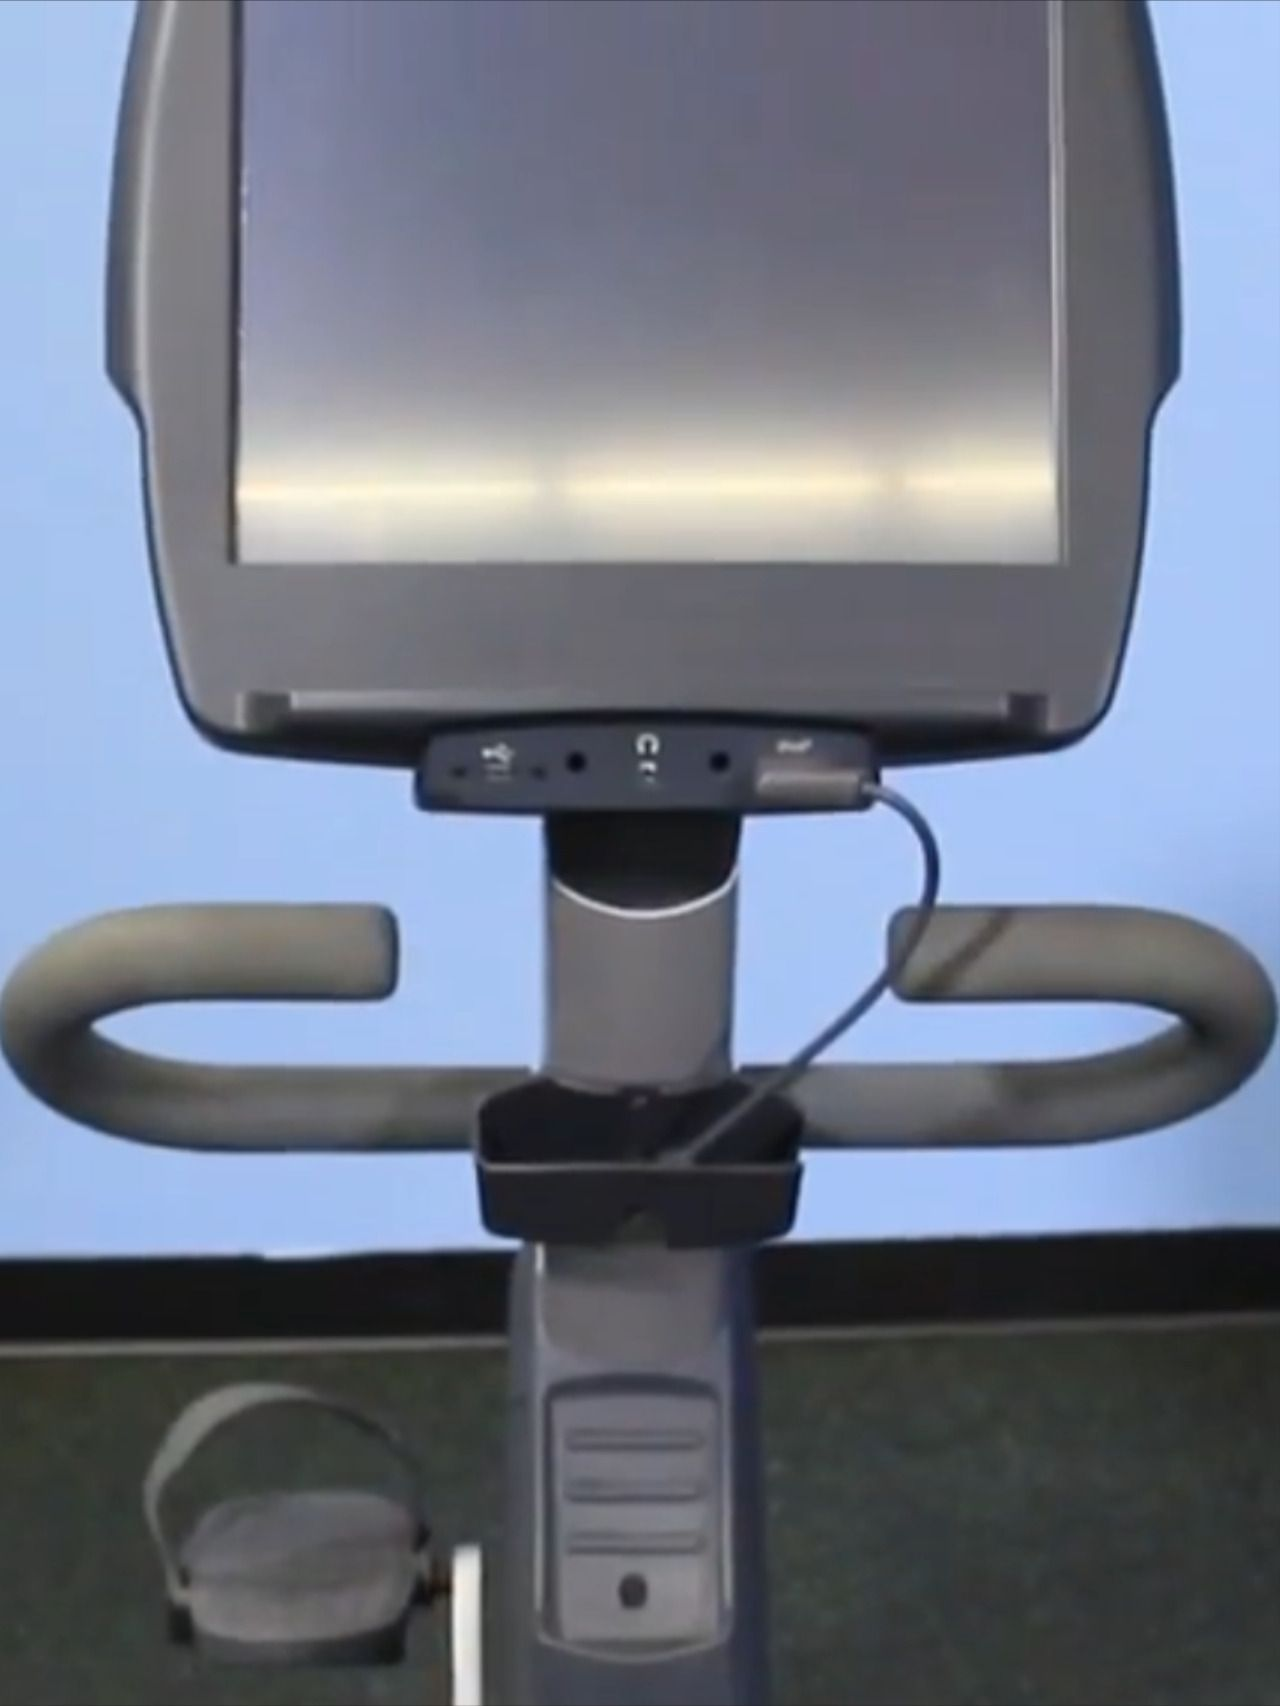 Used Electric Bikes Craigslist : electric, bikes, craigslist, Electric, Craigslist, Bikes, Sale,, Recumbent, Bicycle,